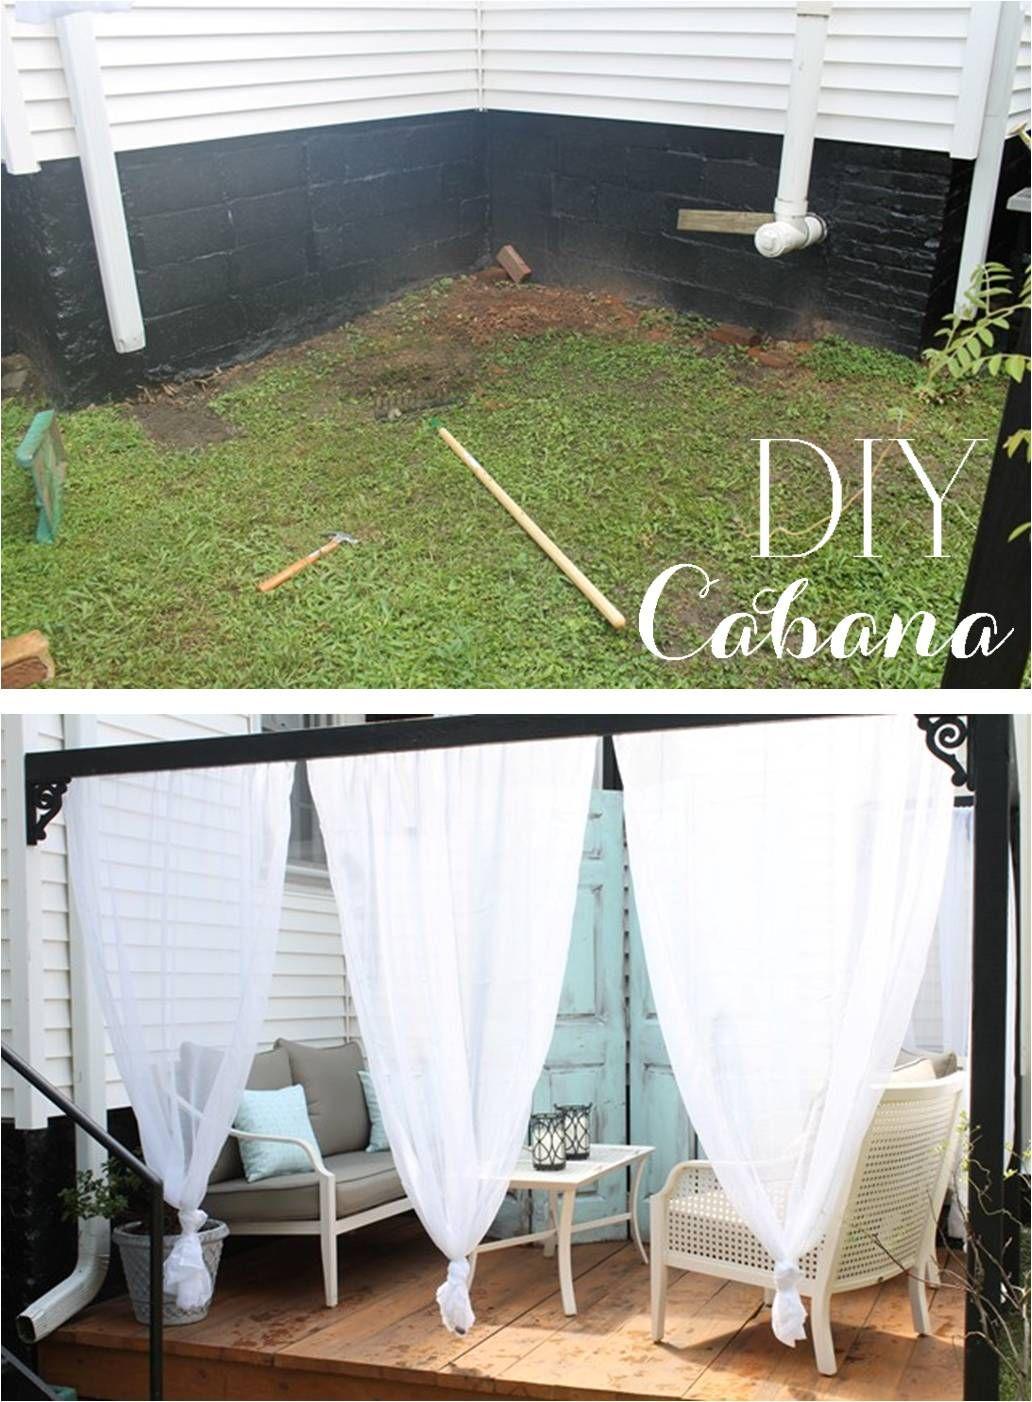 DIY Outdoor Cabana Canopy With Curtains